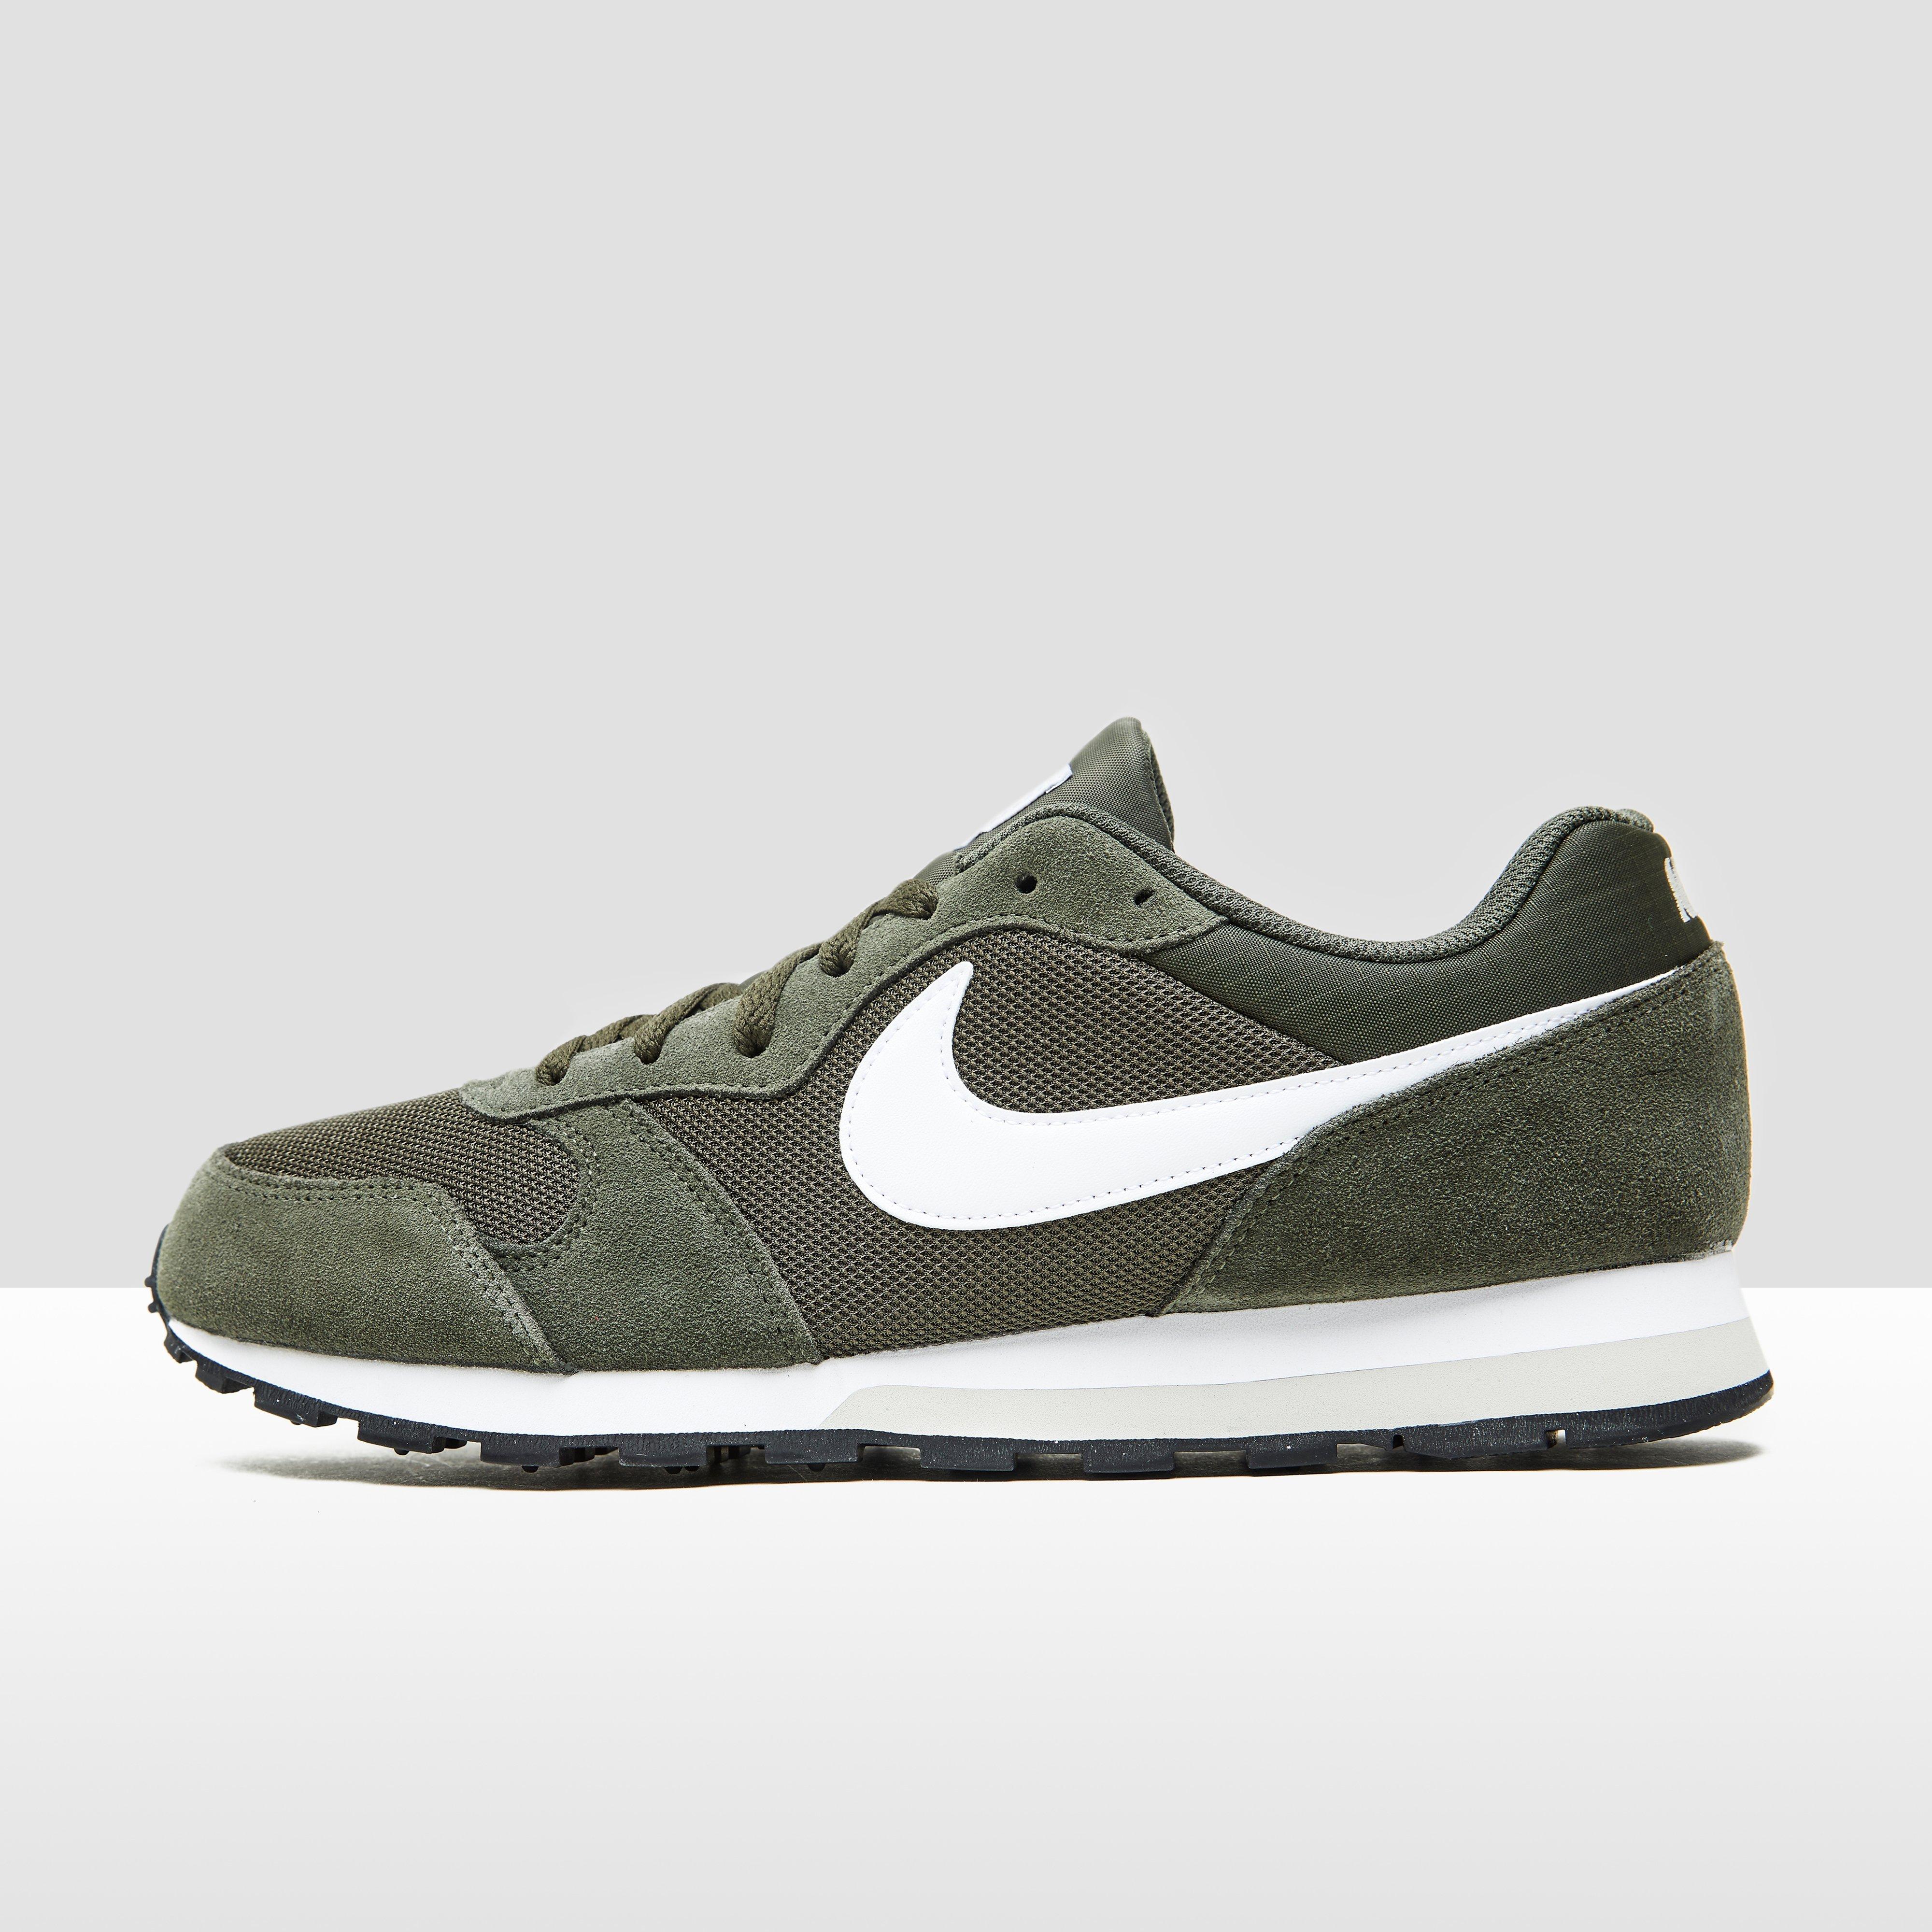 Chaussures Nike Md Khaki Runner Pour Les Hommes eCKb8MaF